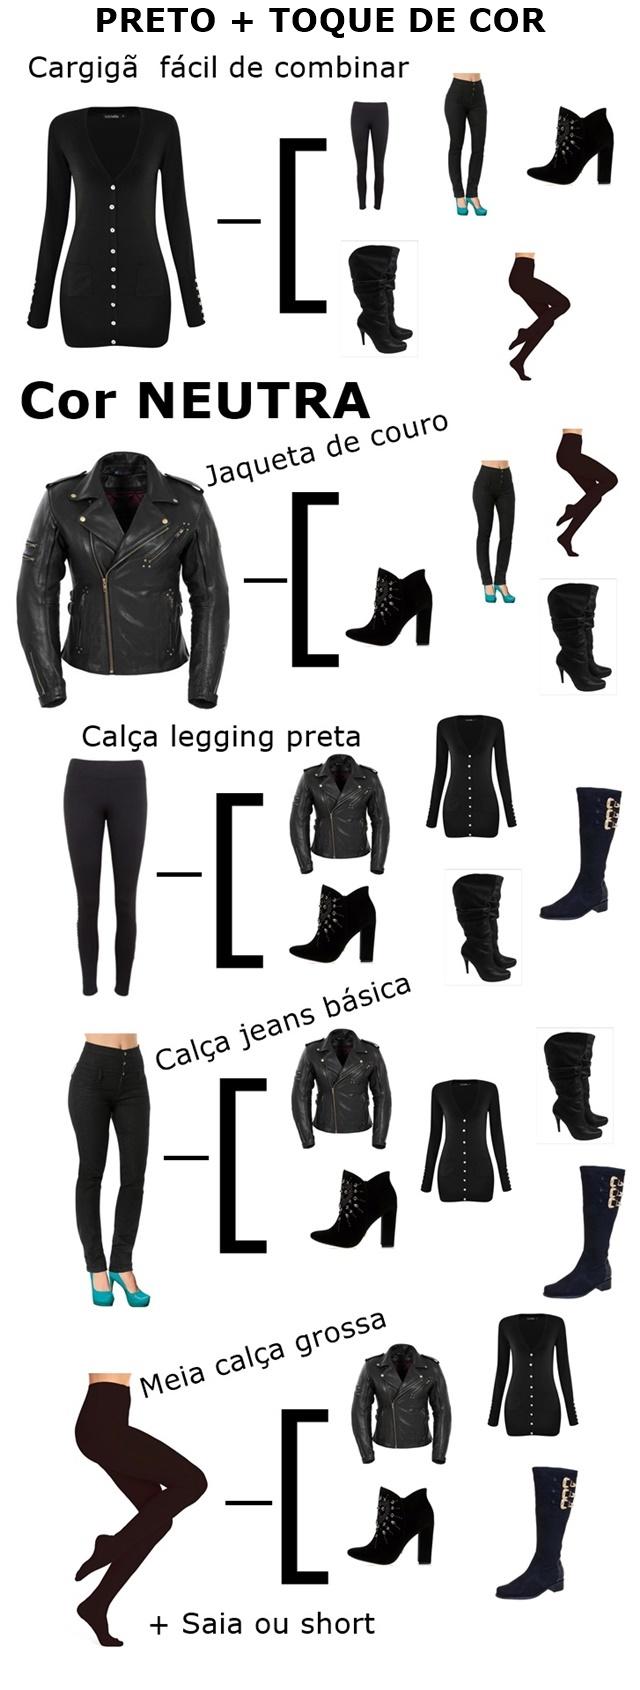 pronta-entrega-legging-estampada-onca_1367943618068_BIG